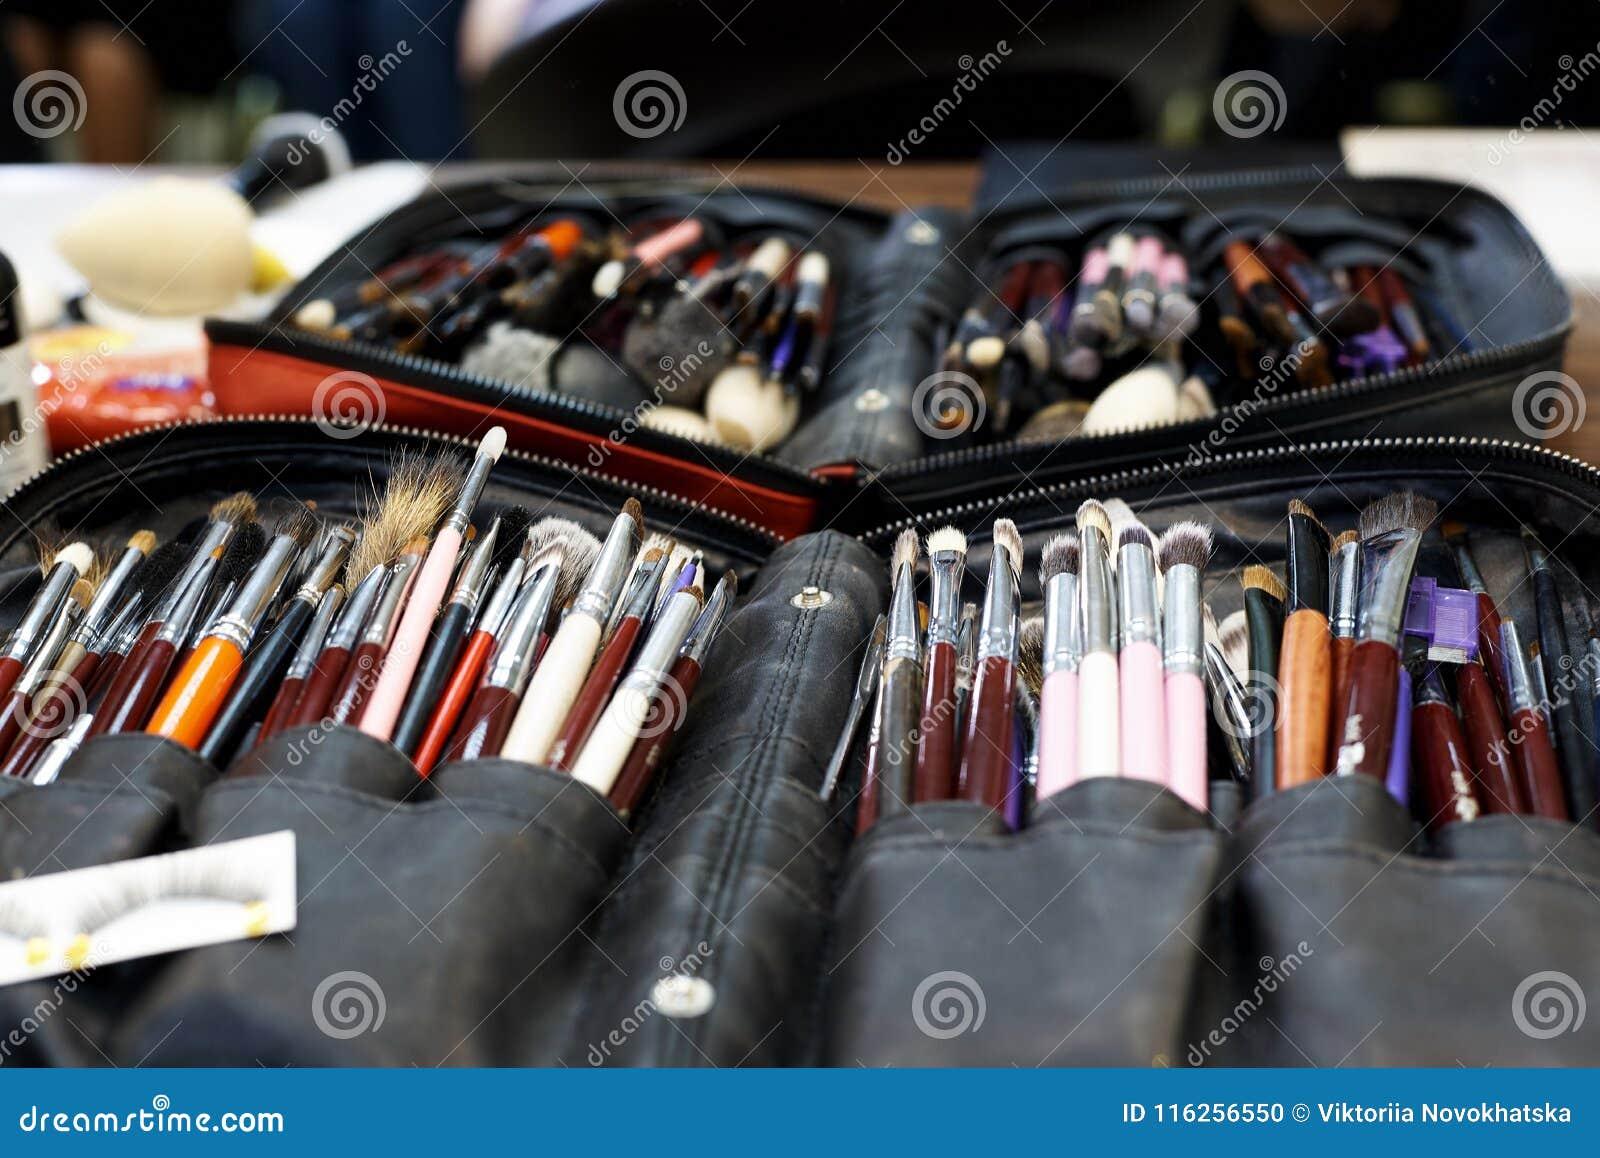 A set of various make-up brushes